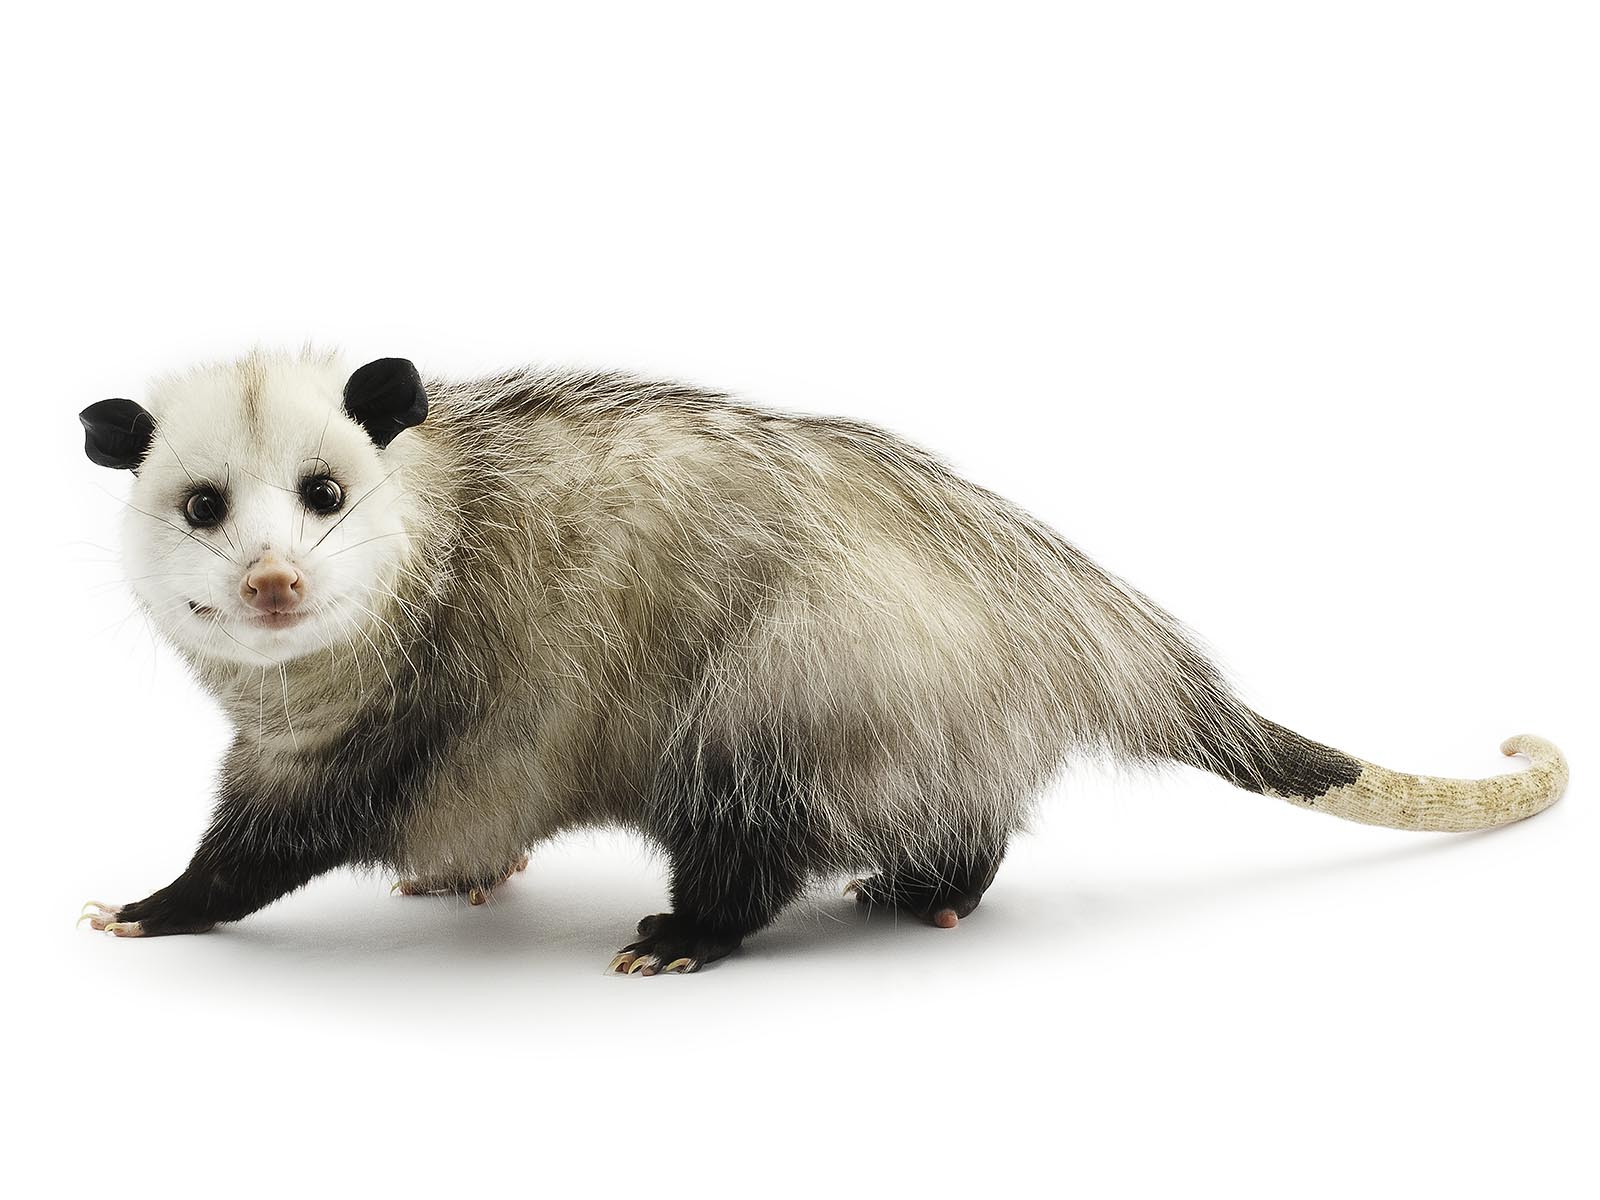 FitzSimmons_3_Virginia_Opossum.jpg